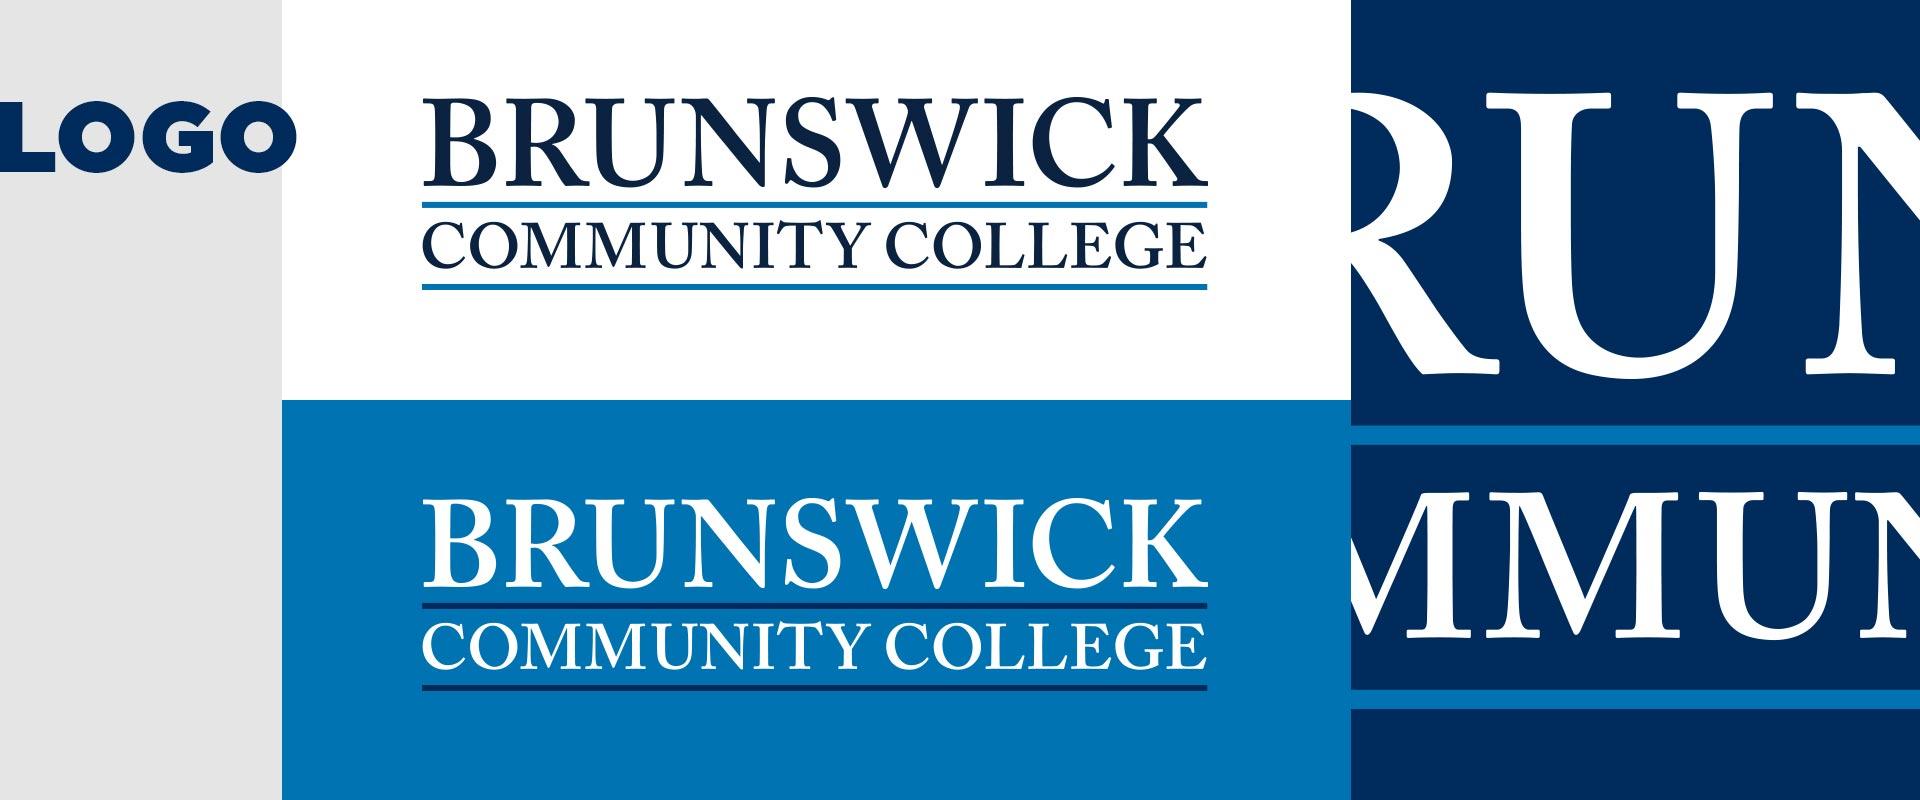 Brunswick Community College - Brand Assets by Springer Studios, Wilmington, NC